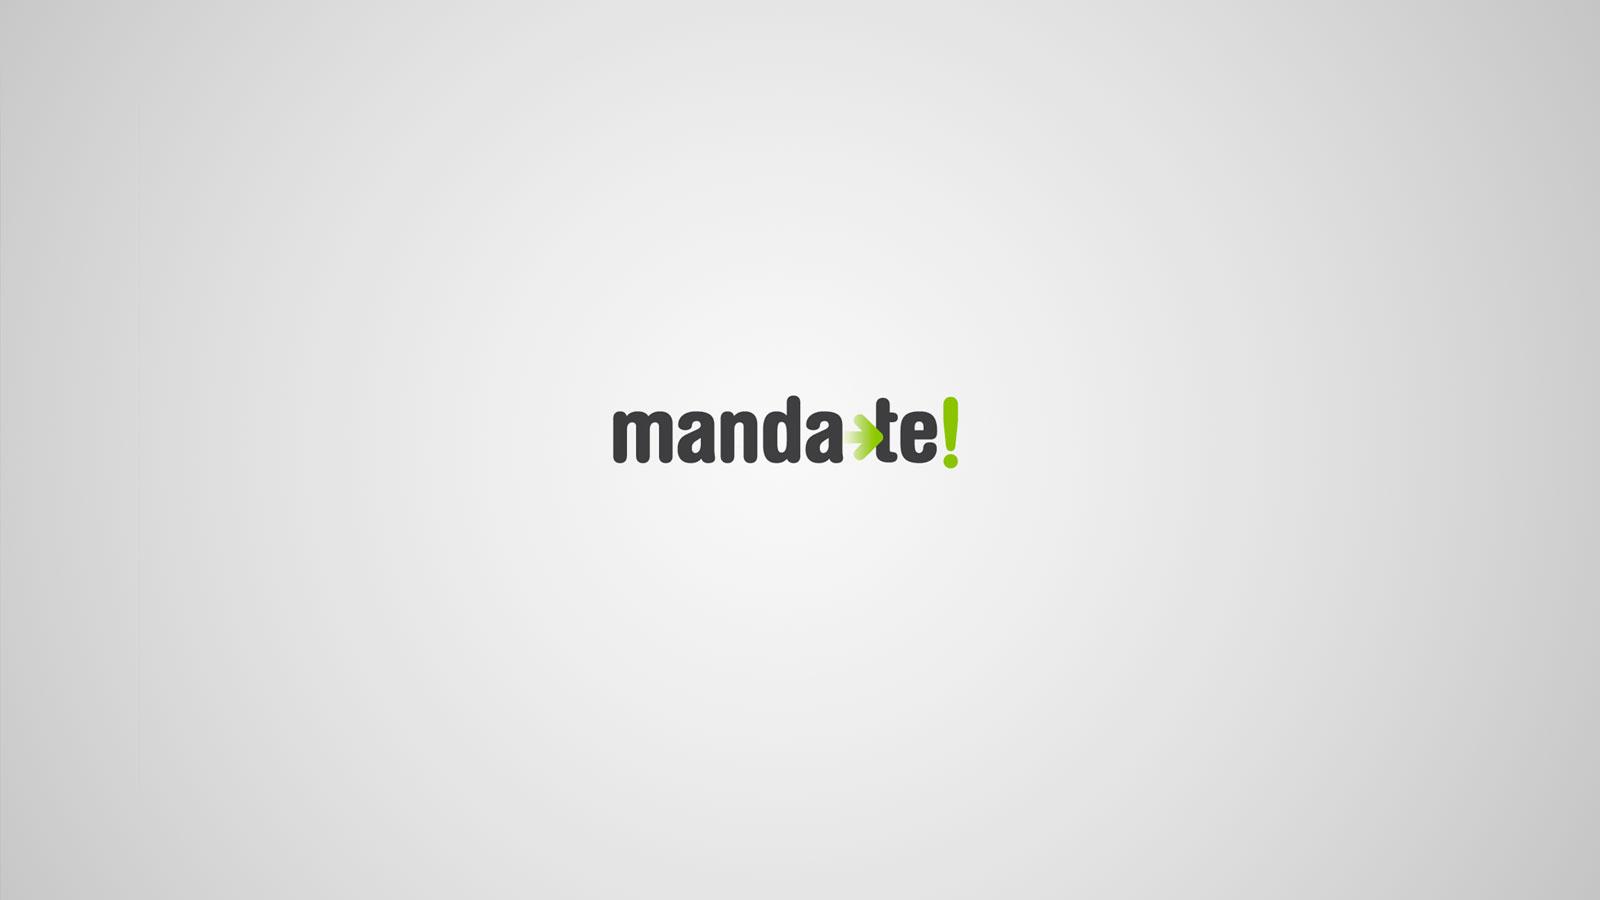 manda-te_04